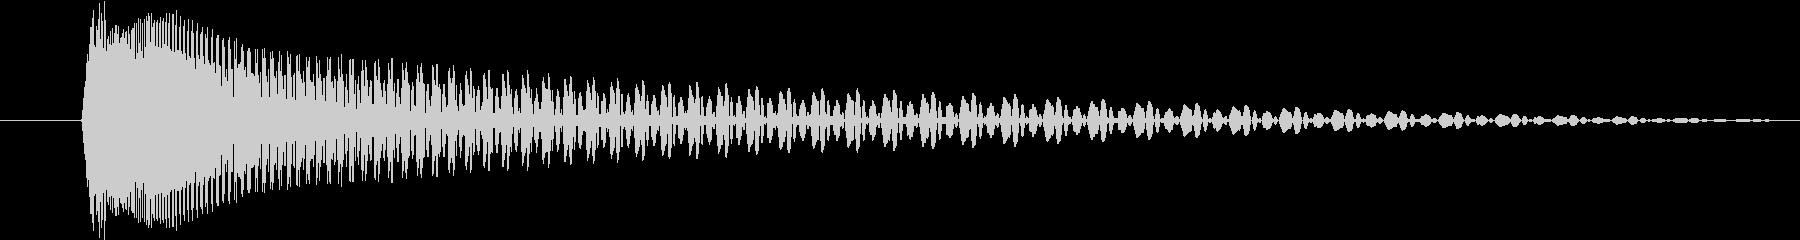 Jewoune (stop, stop image)'s unreproduced waveform